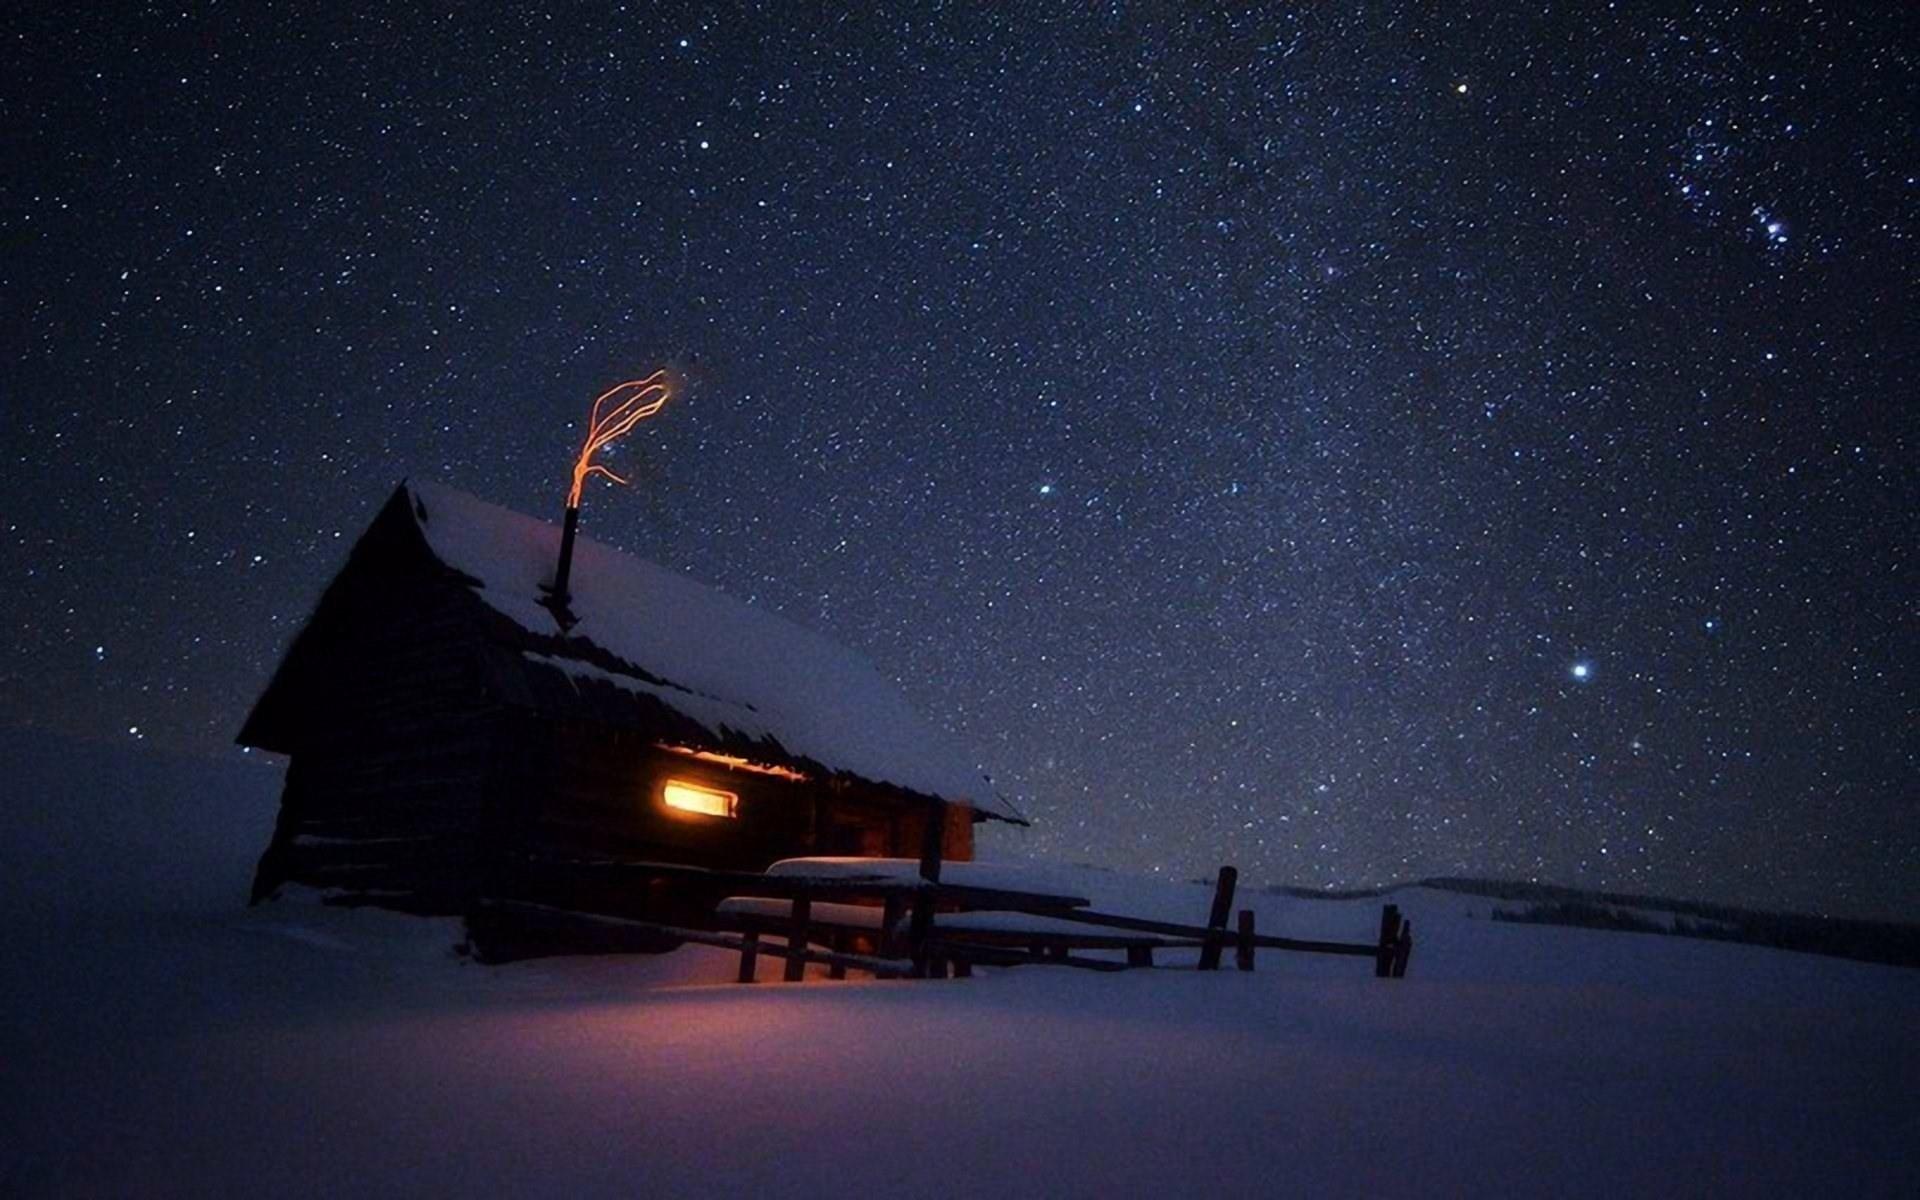 winter night stars wallpaper hd desktop